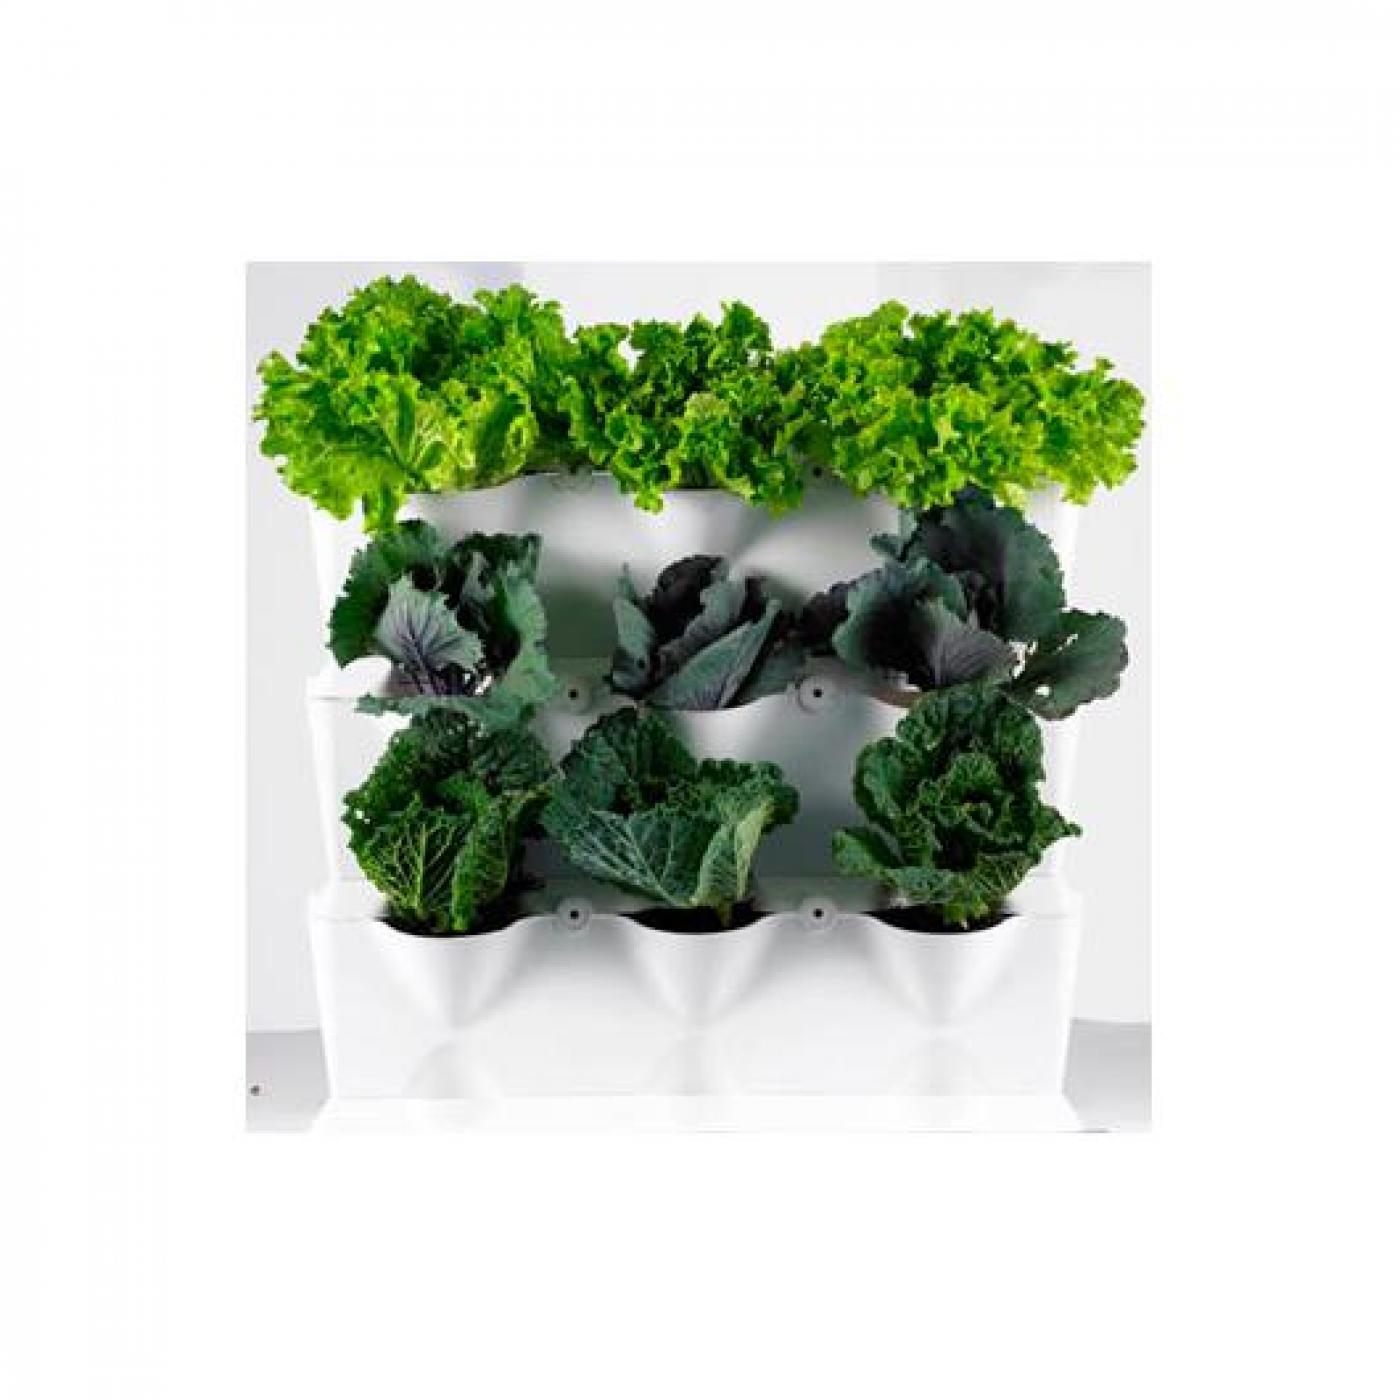 jardim vertical venda:Jardím vertical minigarden branco por €51,45 em Planeta Huerto